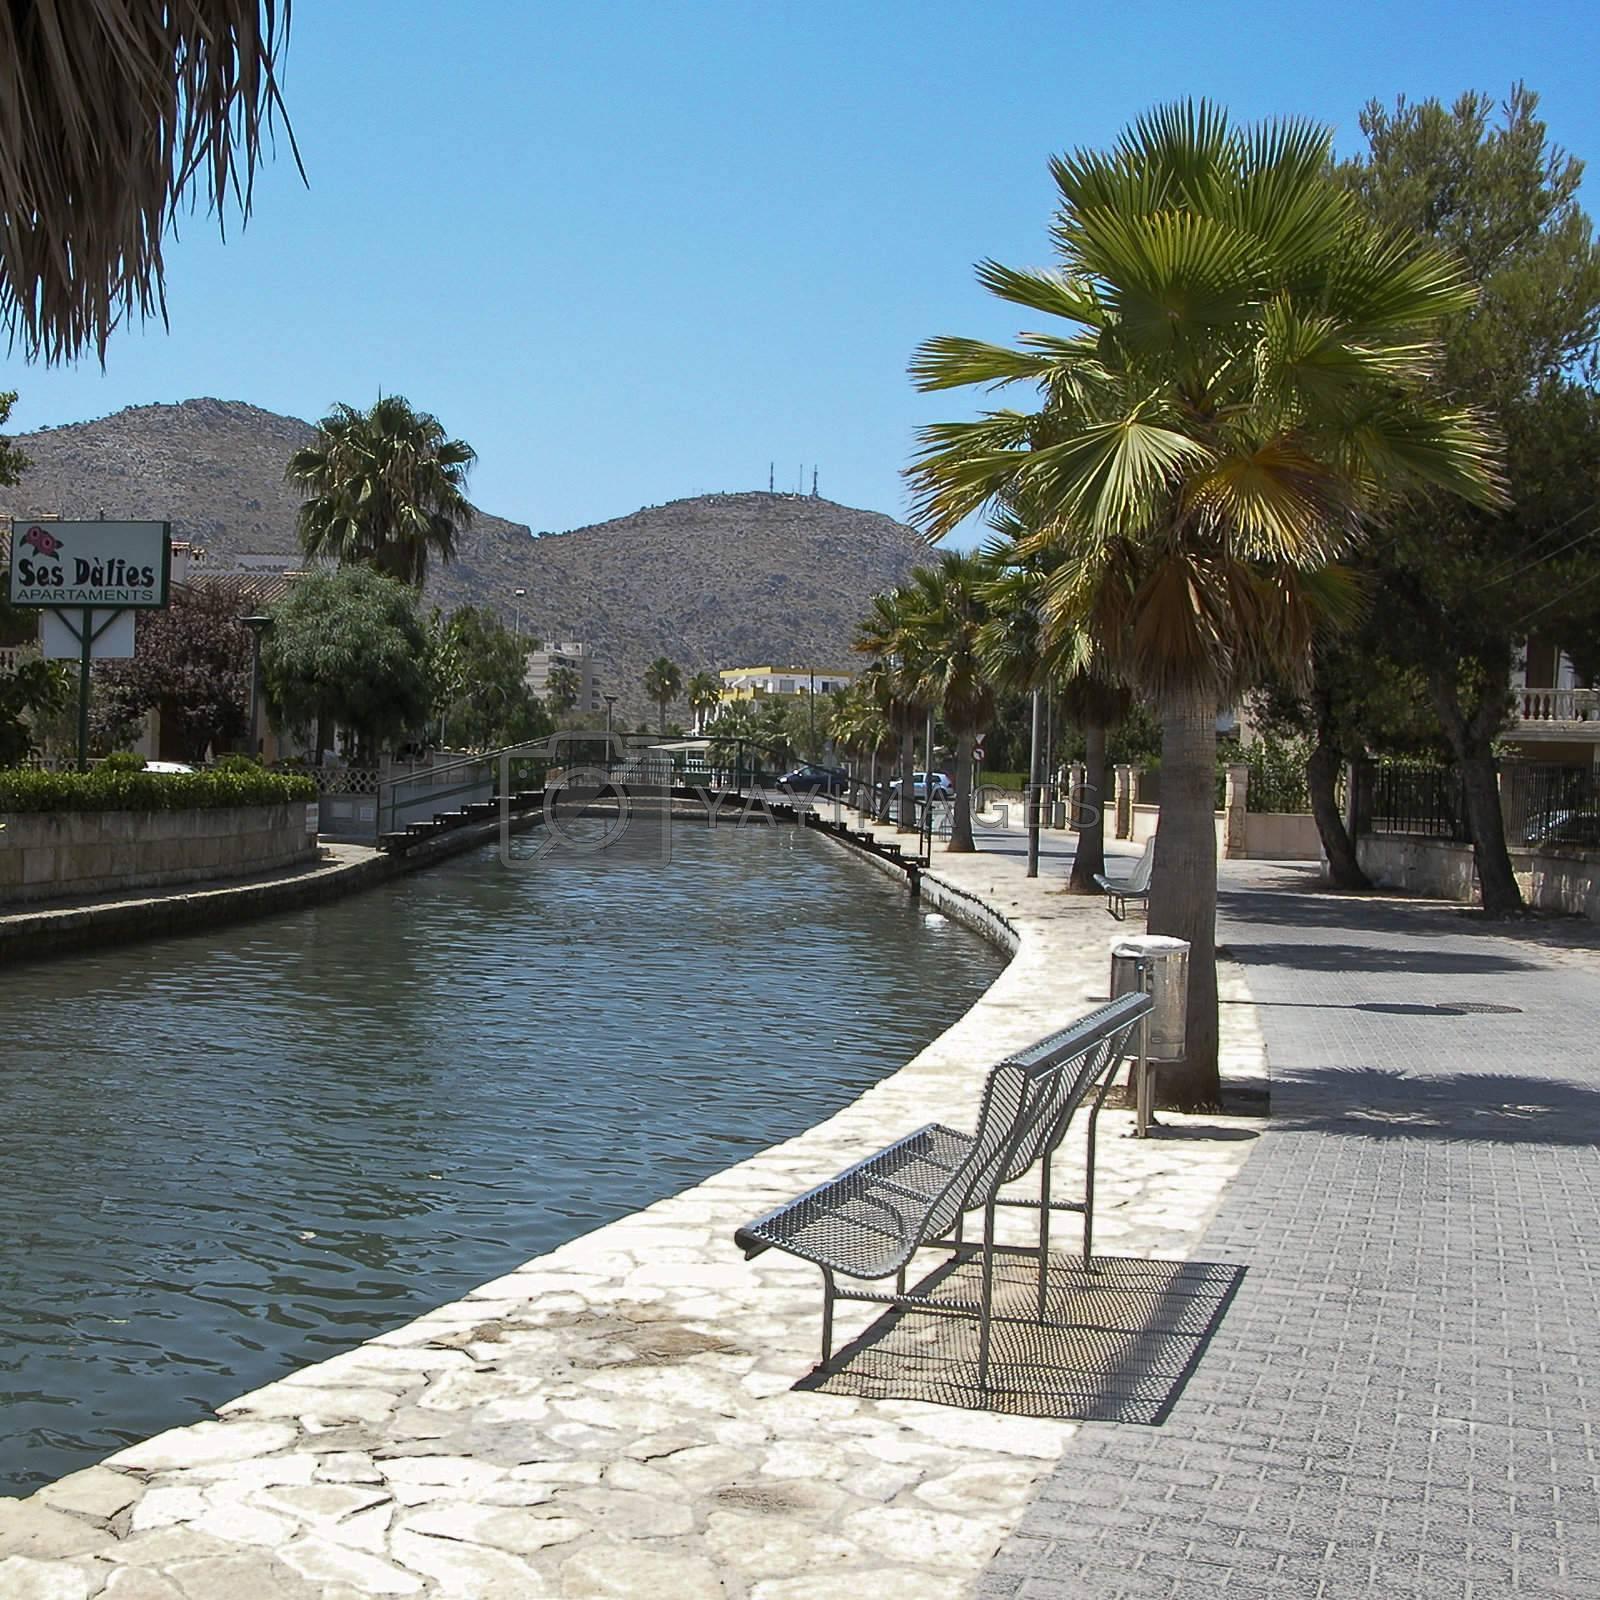 River crossing the city in Alcudia